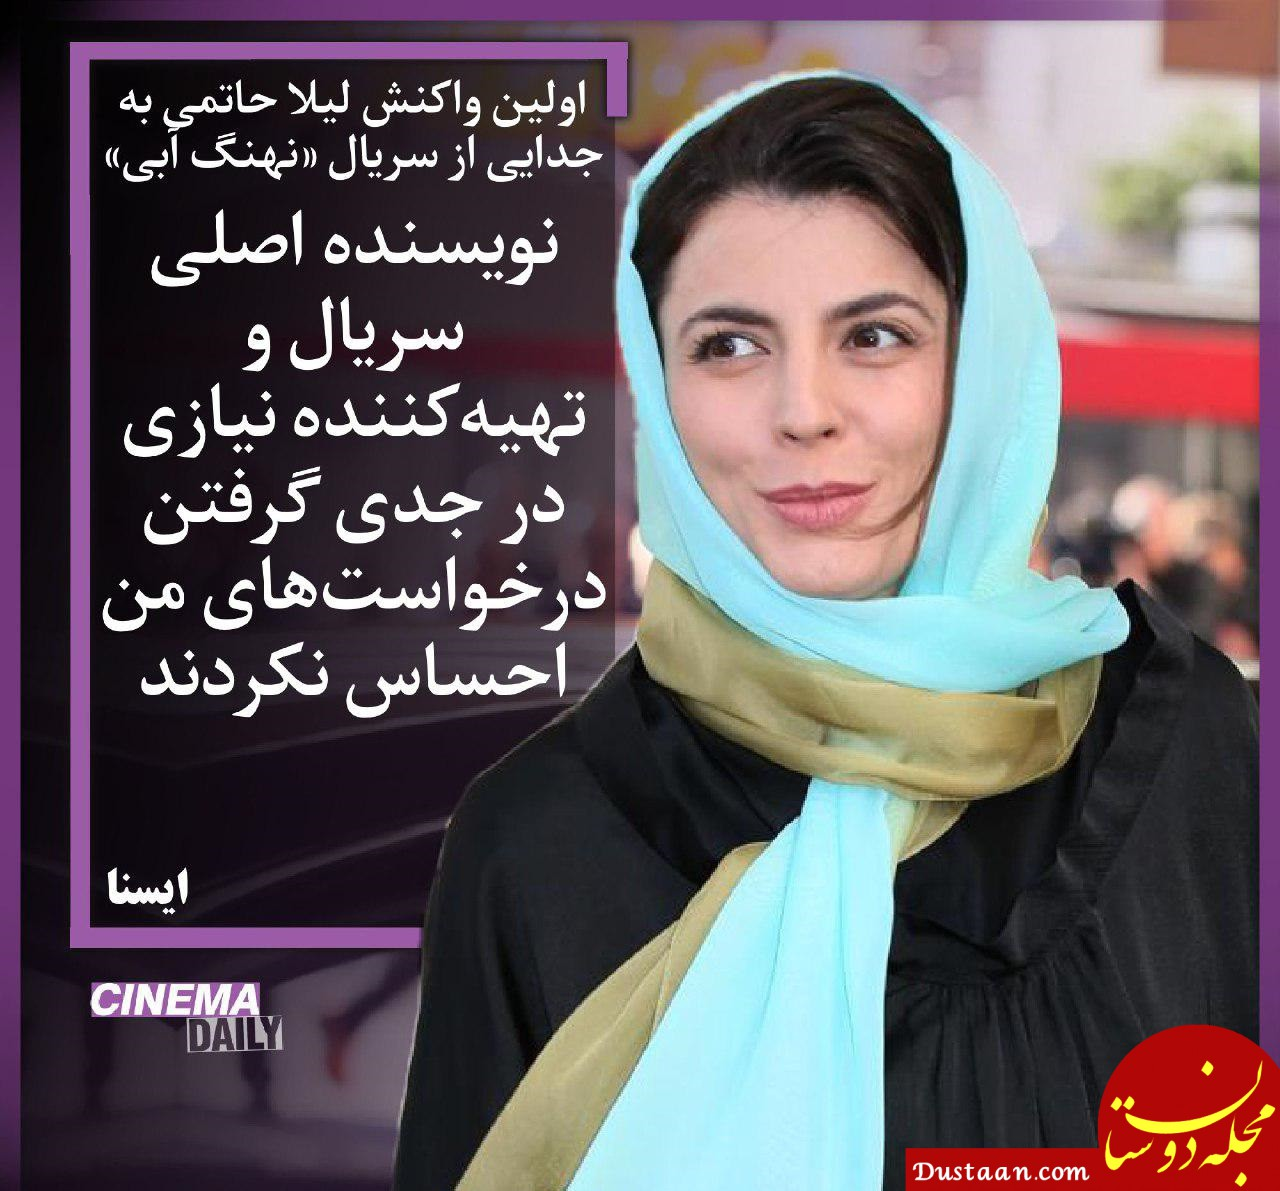 www.dustaan.com واکنش لیلا حاتمی به جدایی از سریال «نهنگ آبی» +عکس